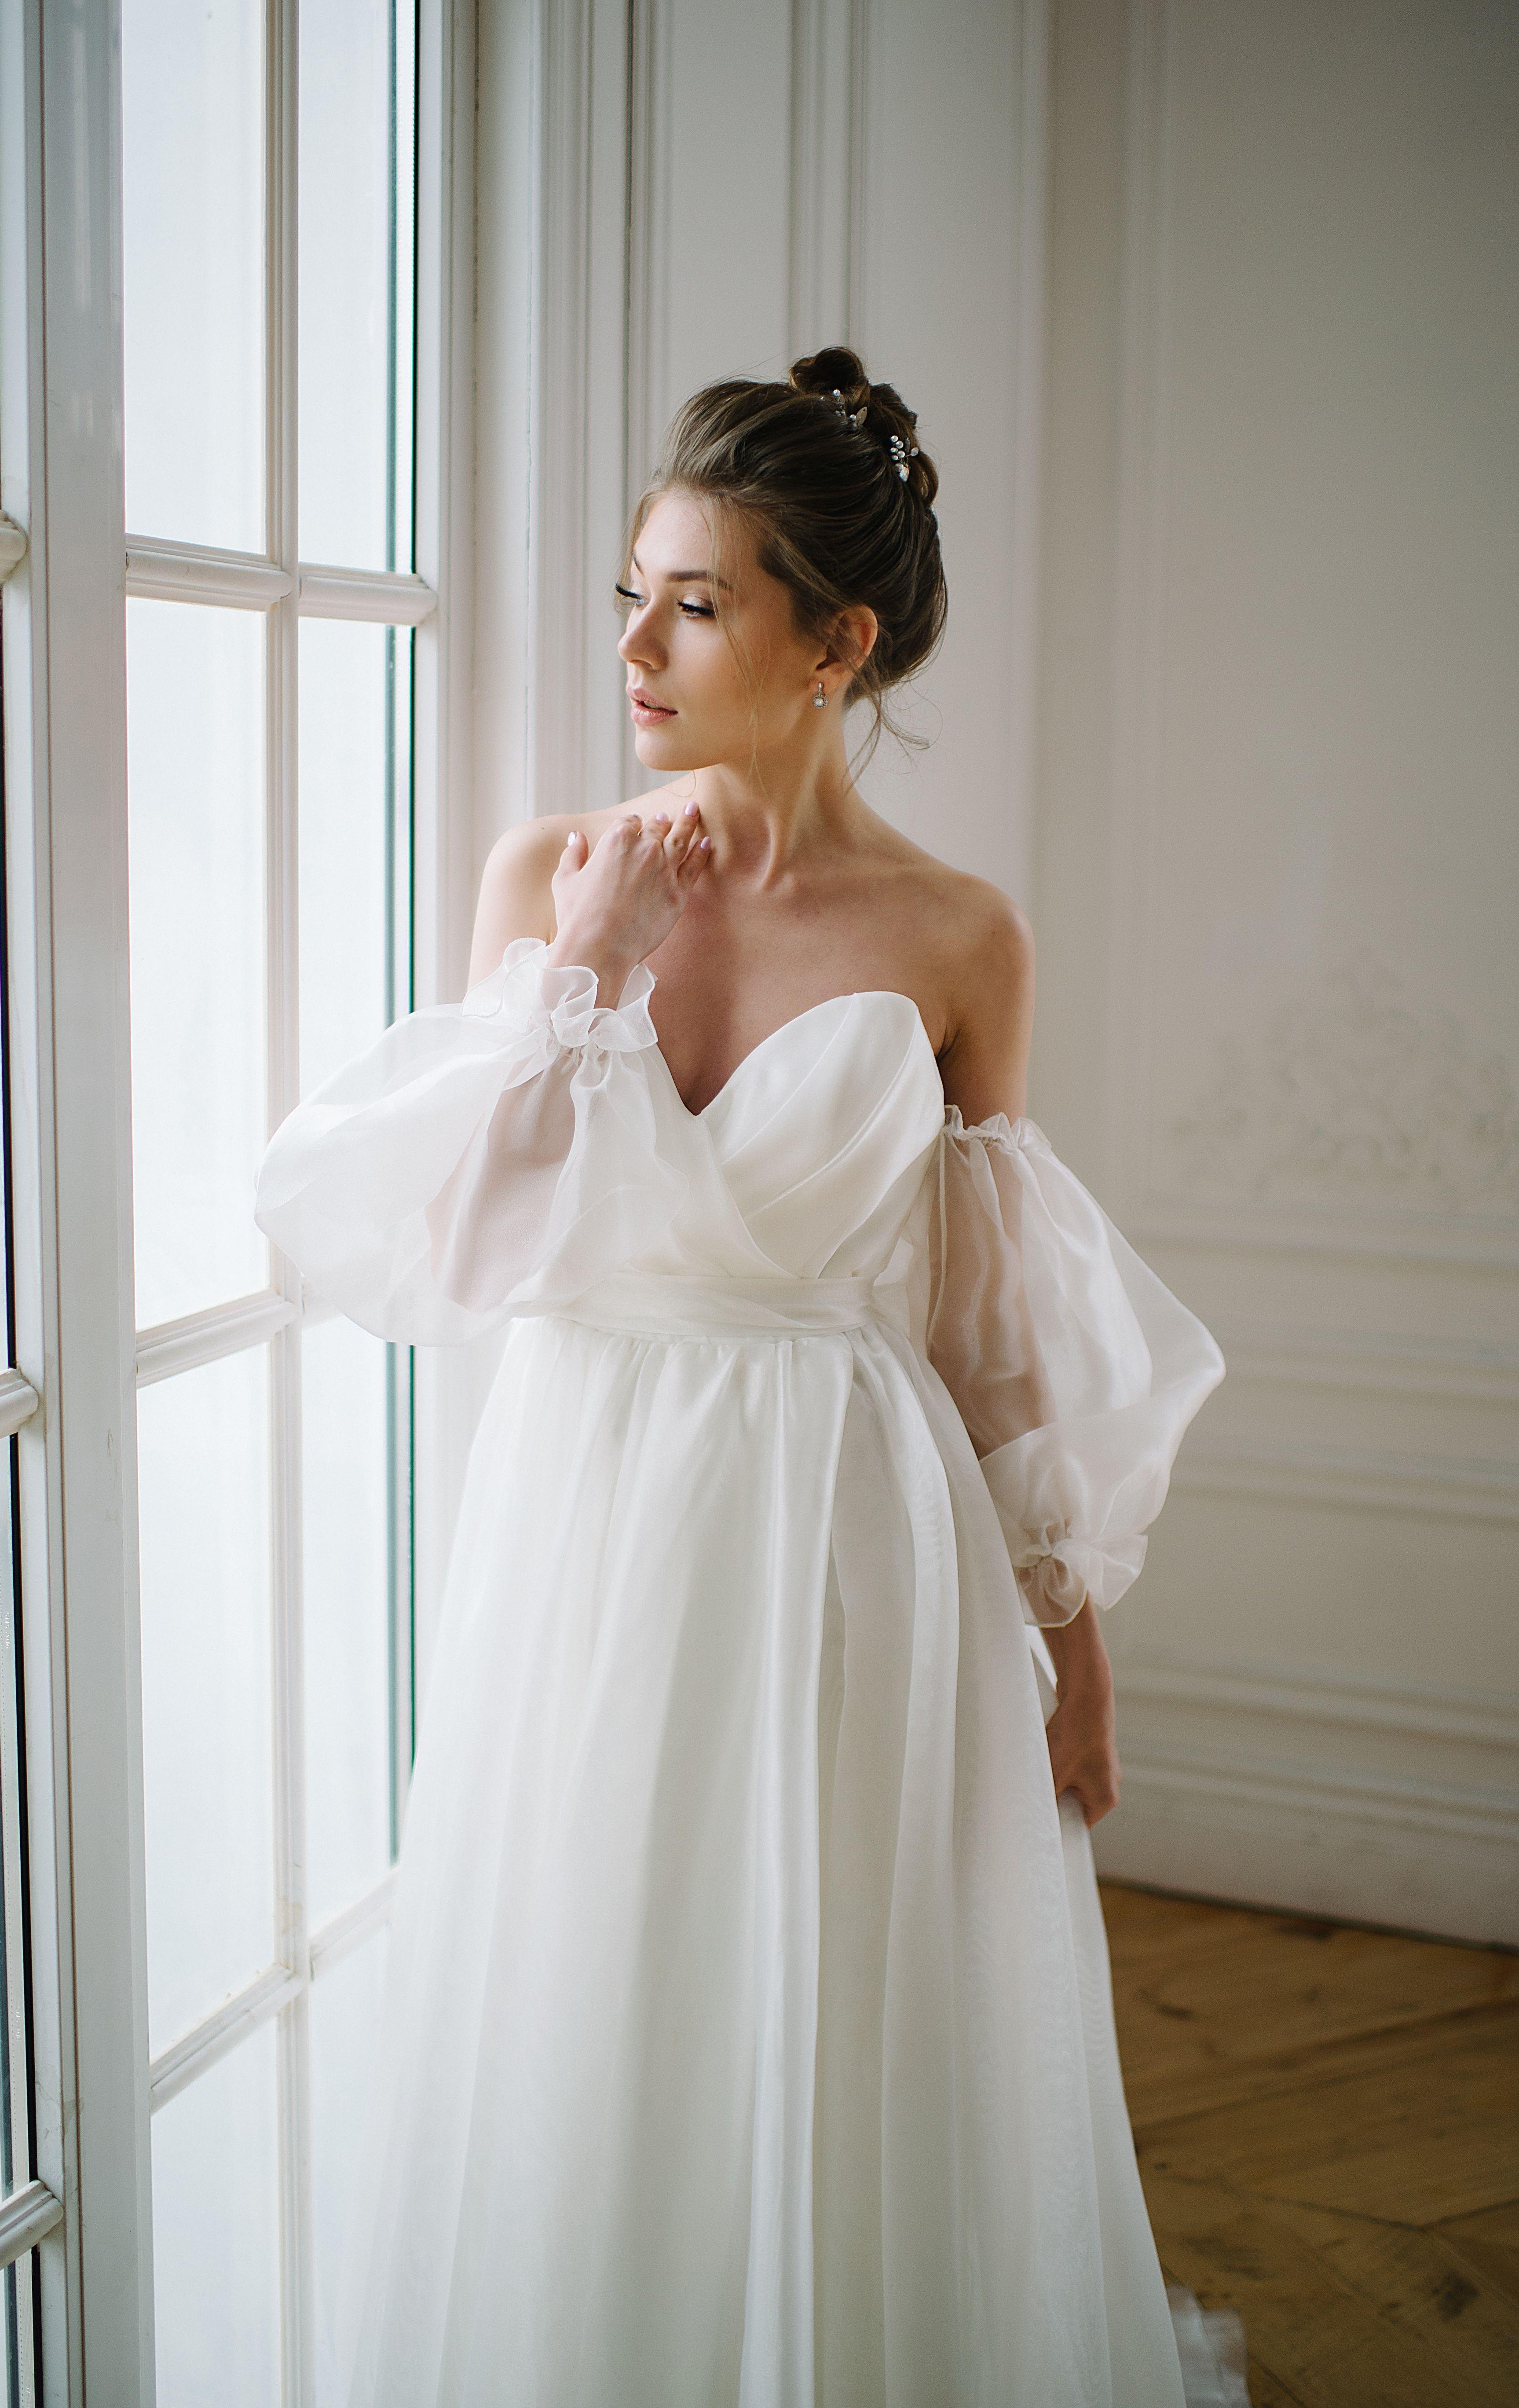 Summer Bohemian Wedding Dress By Dream Dress Gorgeous Airy Corset Bridal Dress For Exquisi Necklines For Dresses Trendy Wedding Dresses Wedding Dresses Corset [ 5473 x 3453 Pixel ]